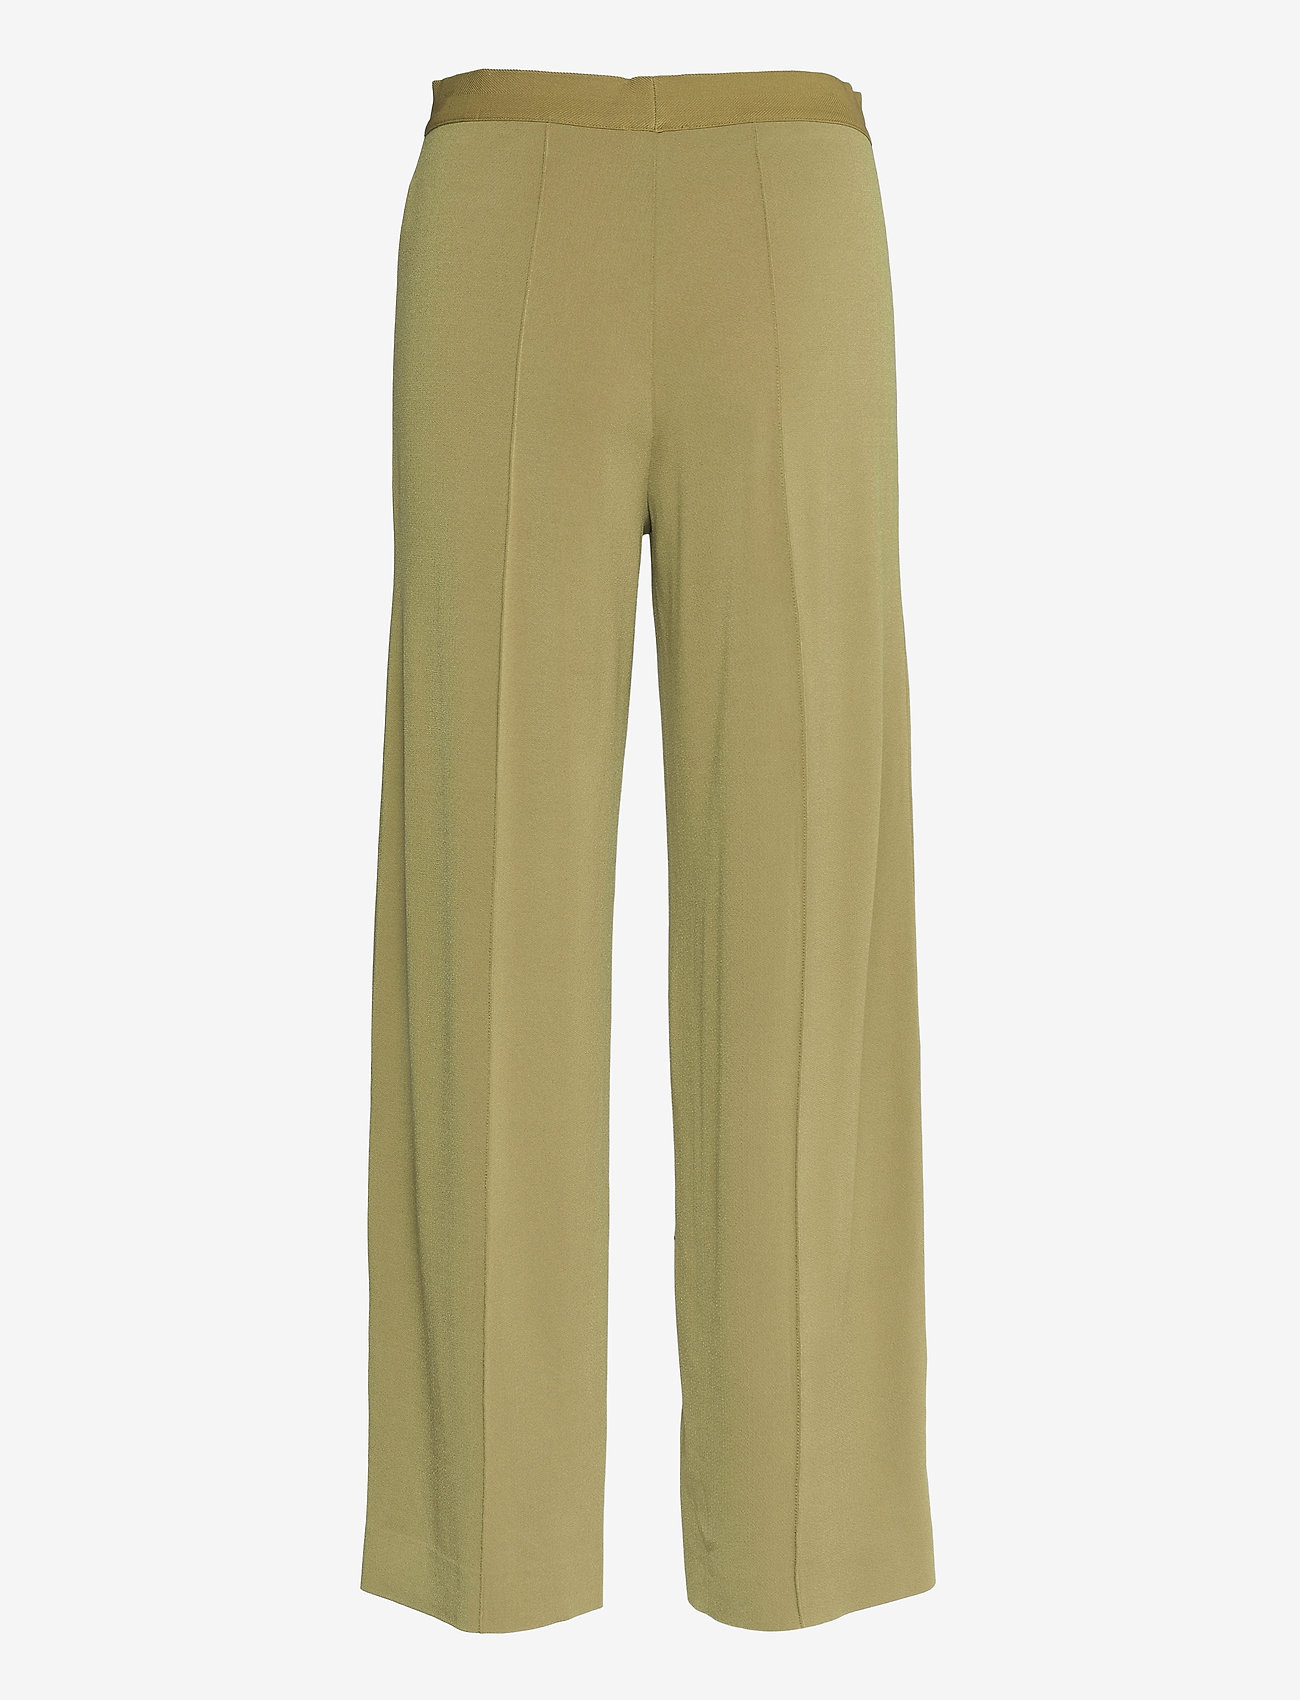 By Malene Birger - MIELA - bukser med brede ben - golden beige - 1